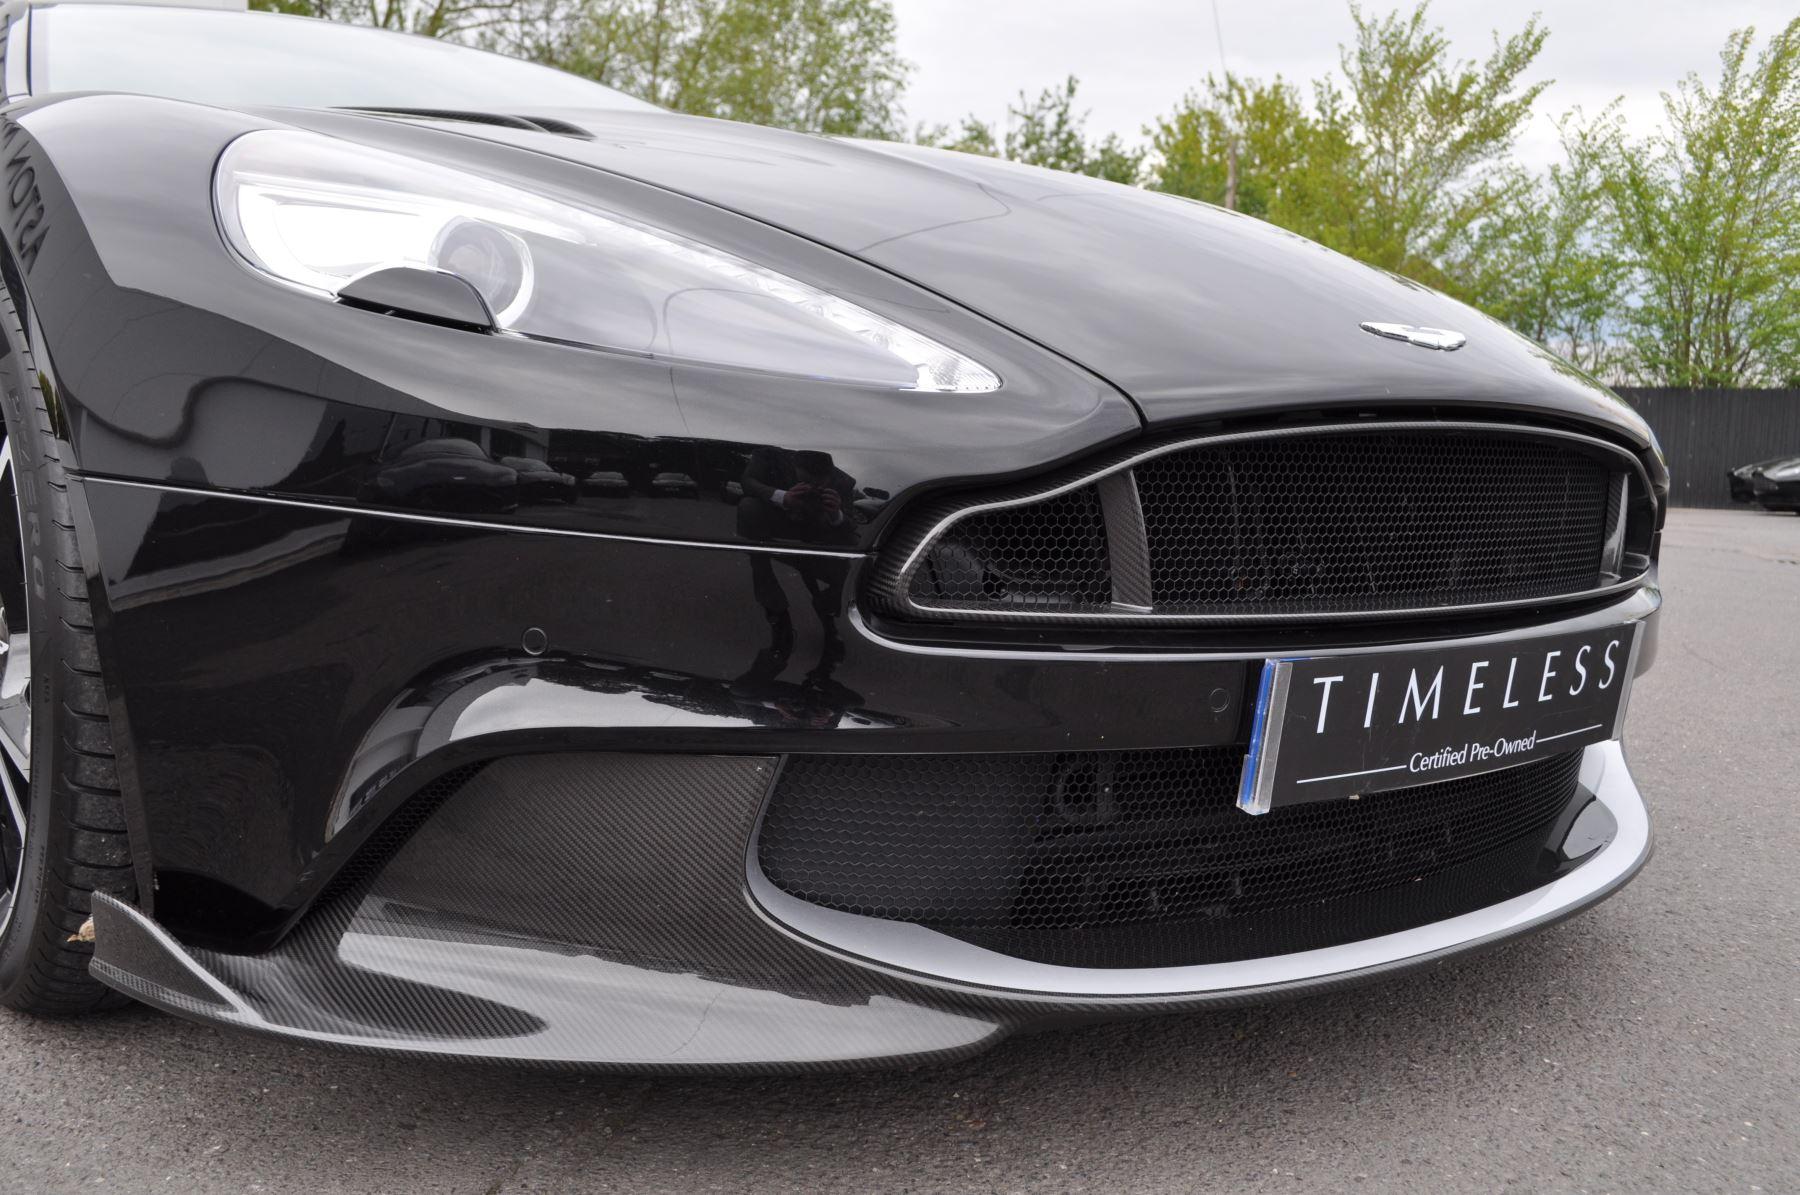 Aston Martin Vanquish V12 [595] S 2+2 2dr Touchtronic image 12